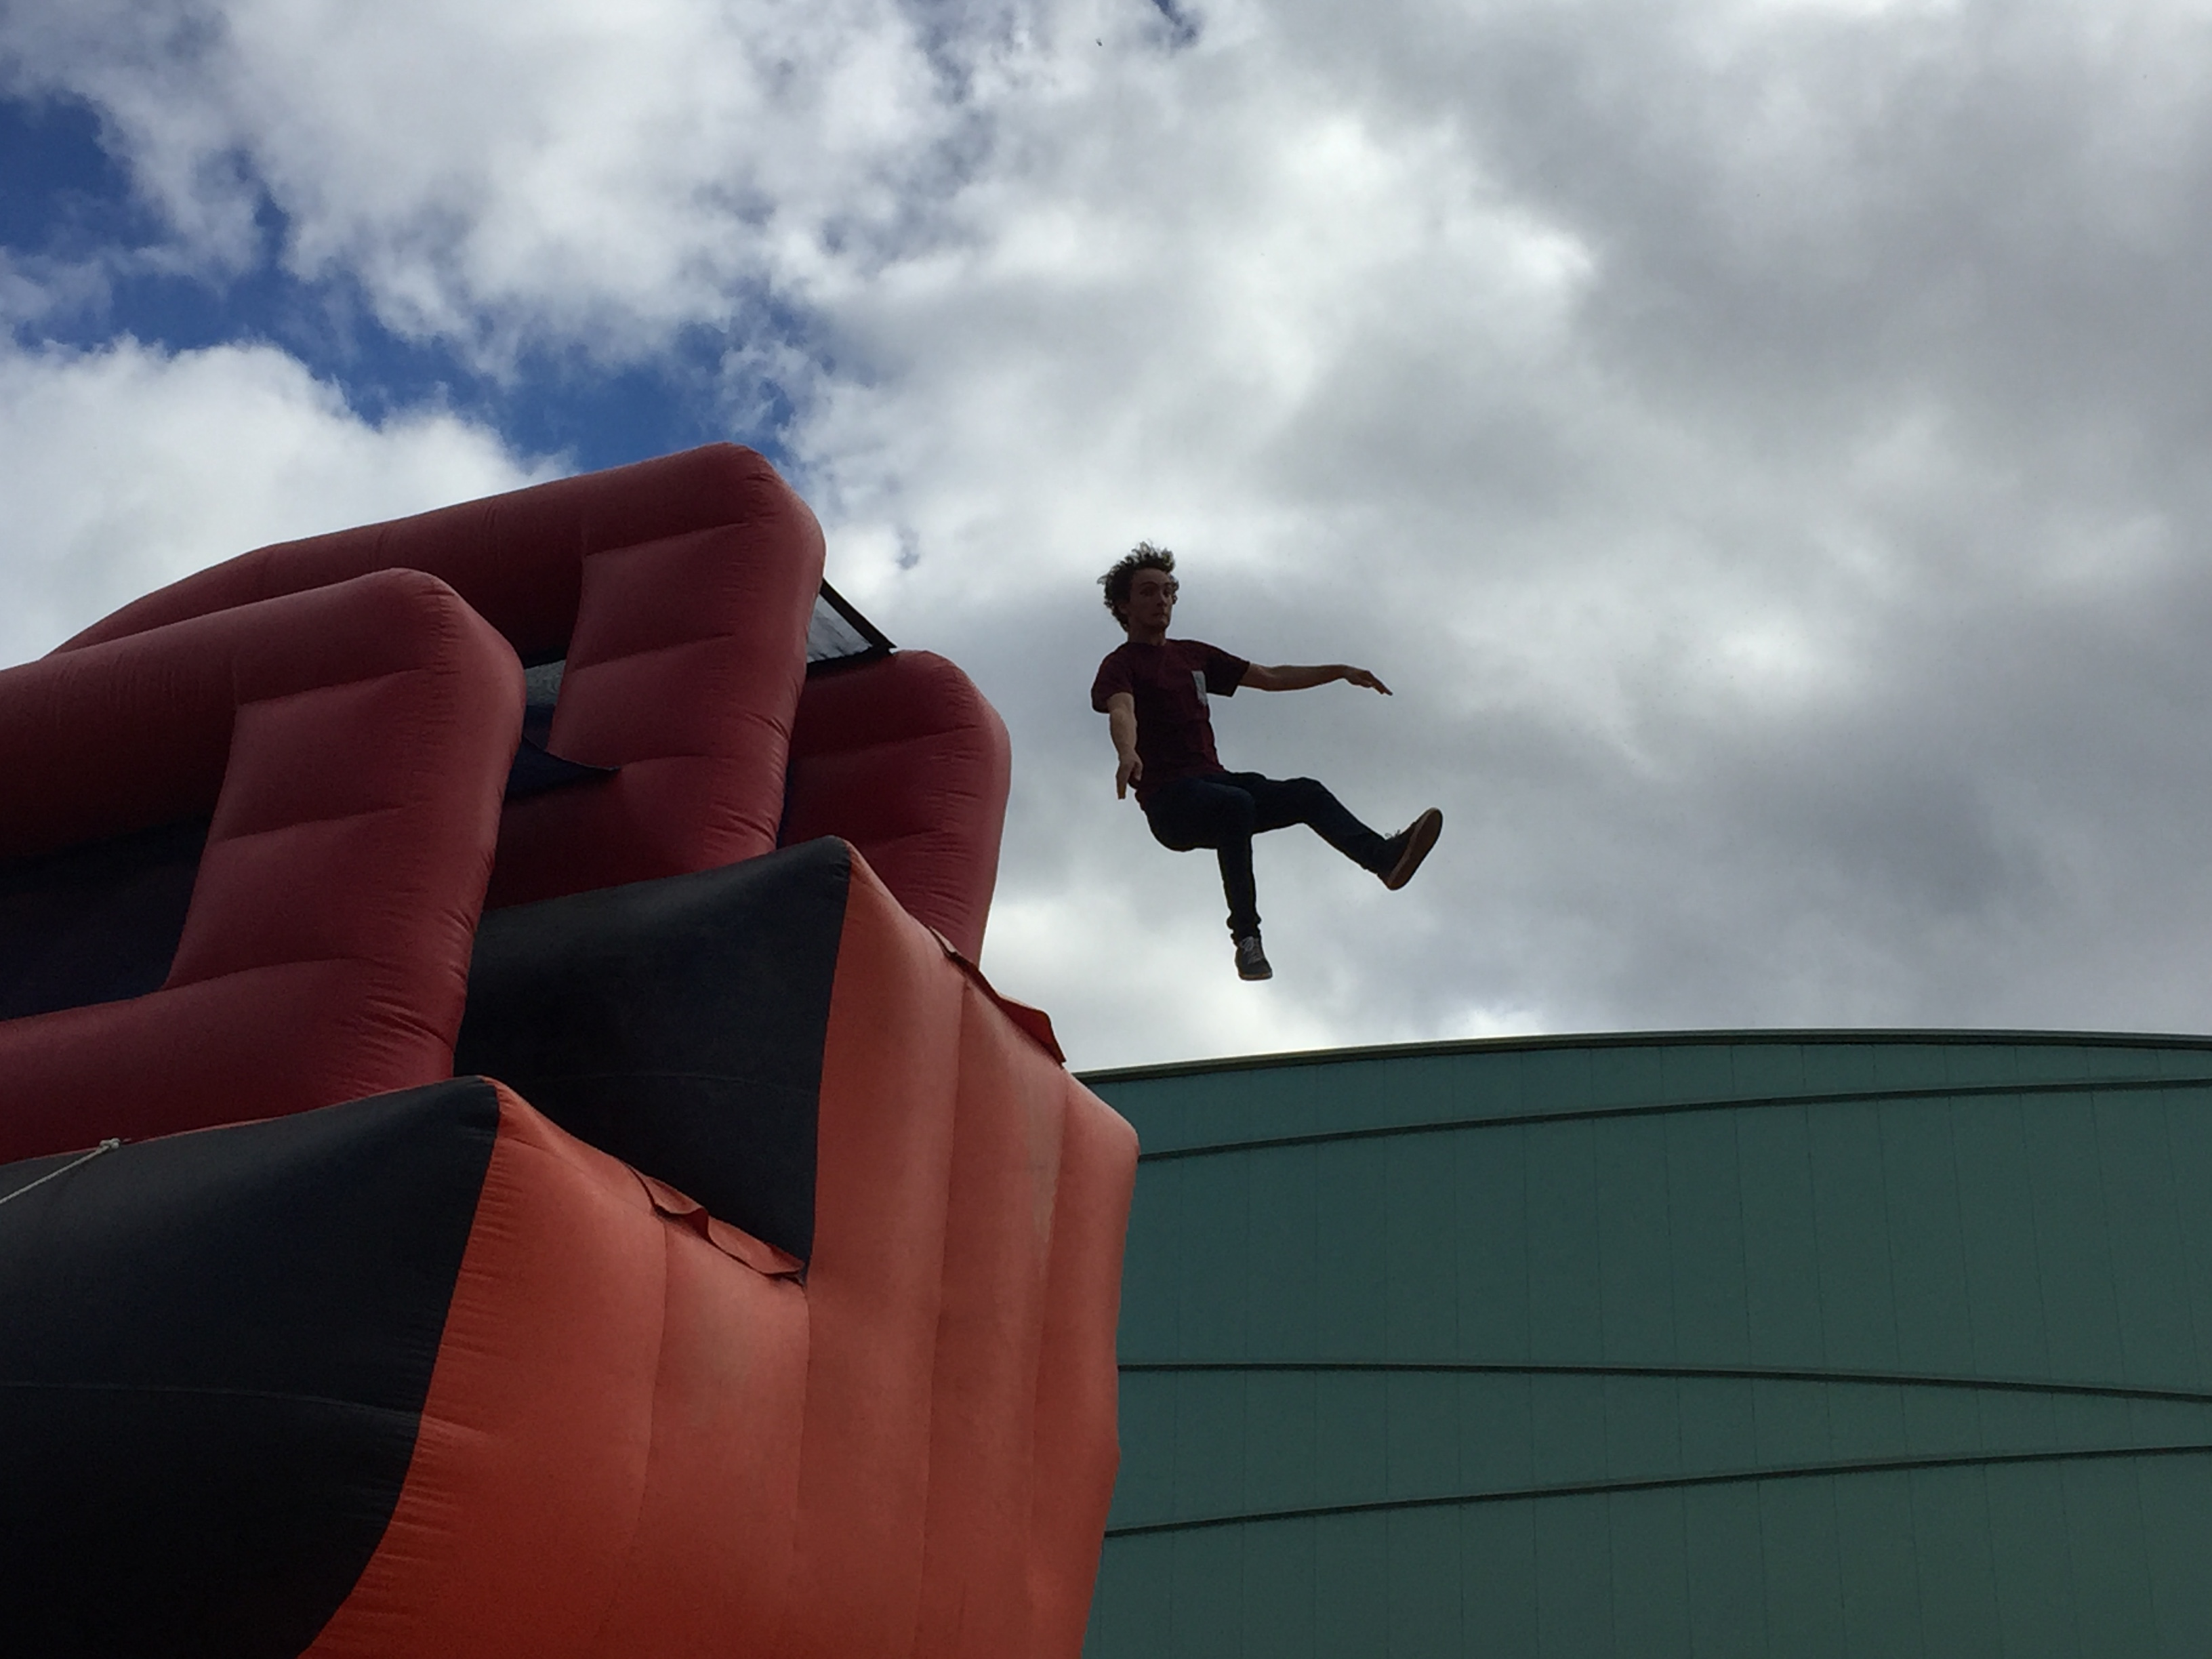 Xtrem jump